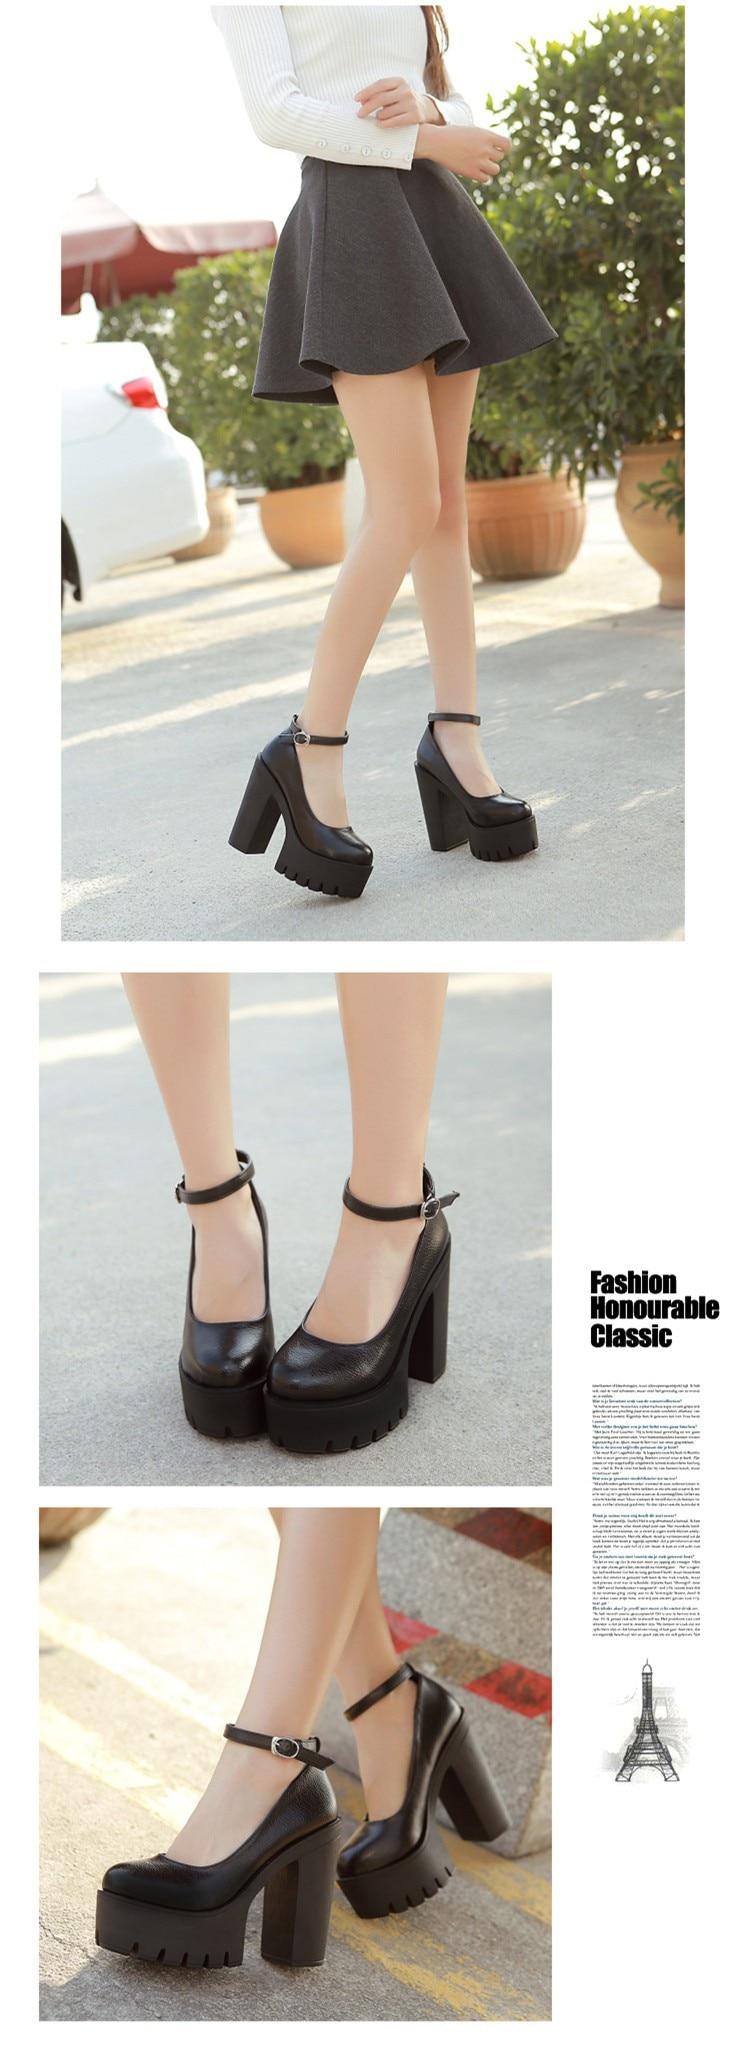 Gdgydh γυναικεία παπούτσια με ενισχυμένο τακούνι 35 με 42 msow